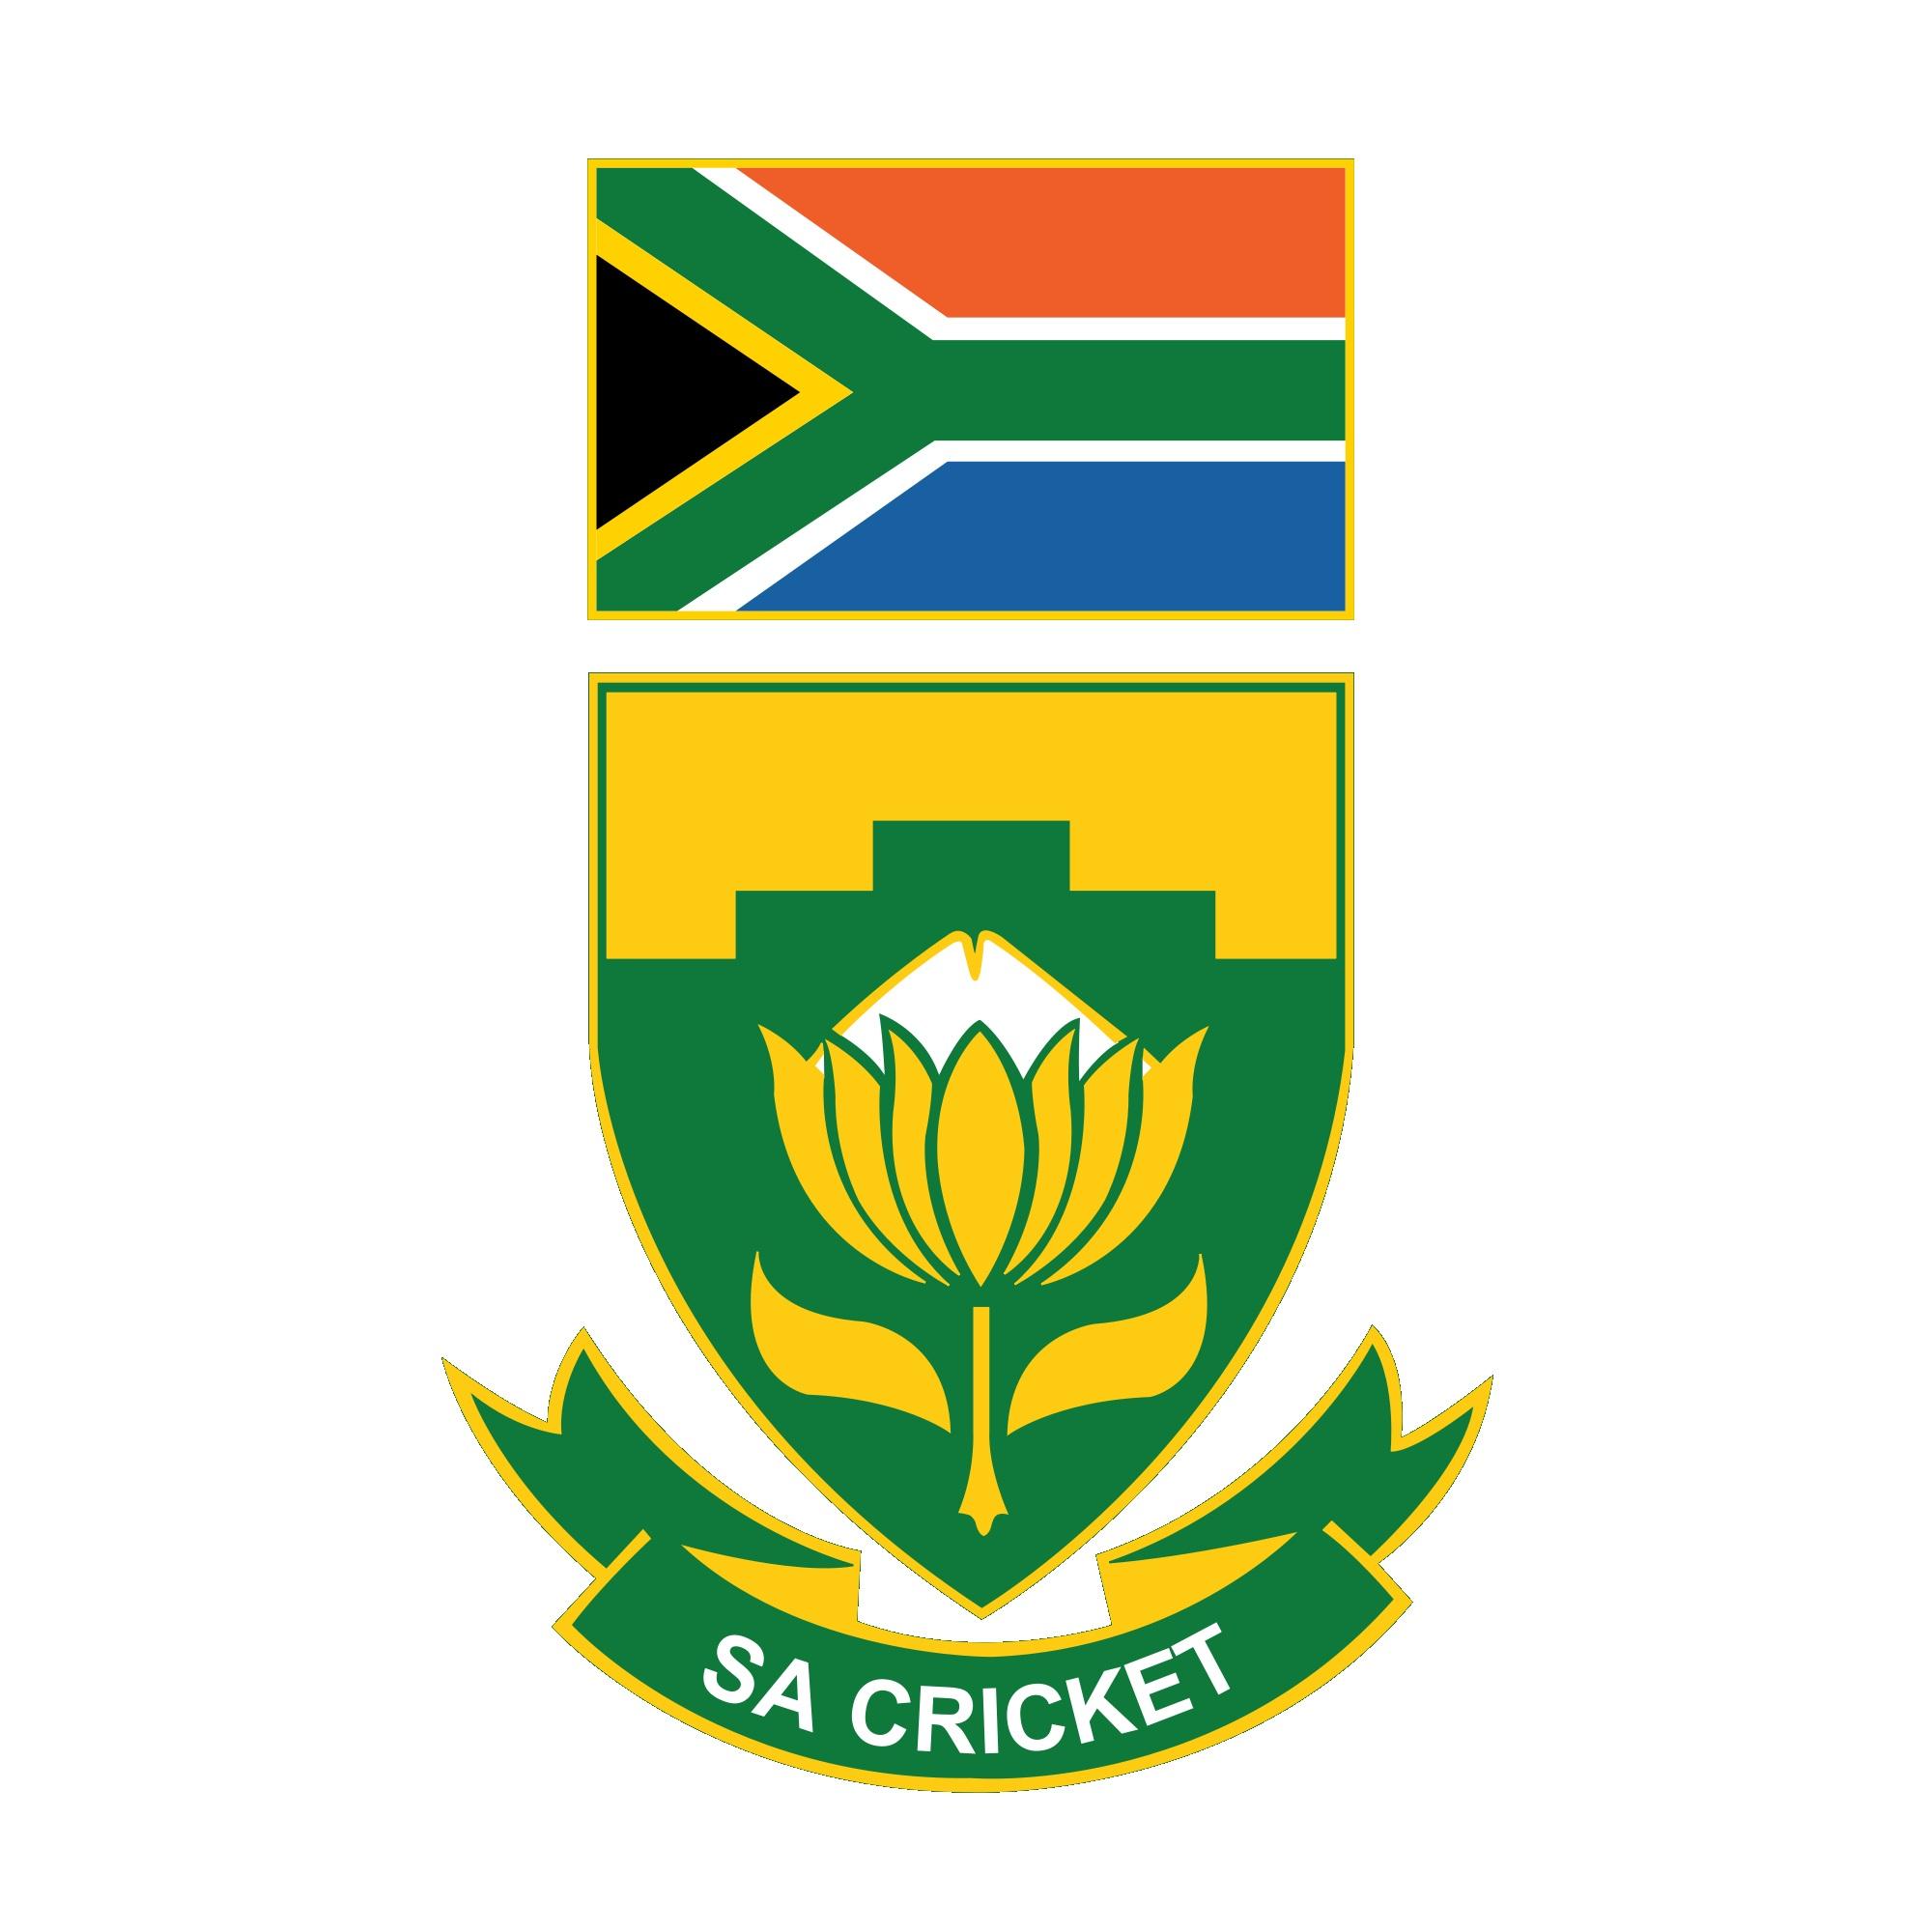 South Africa National Cricket Team Logopedia Fandom Powered By Wikia